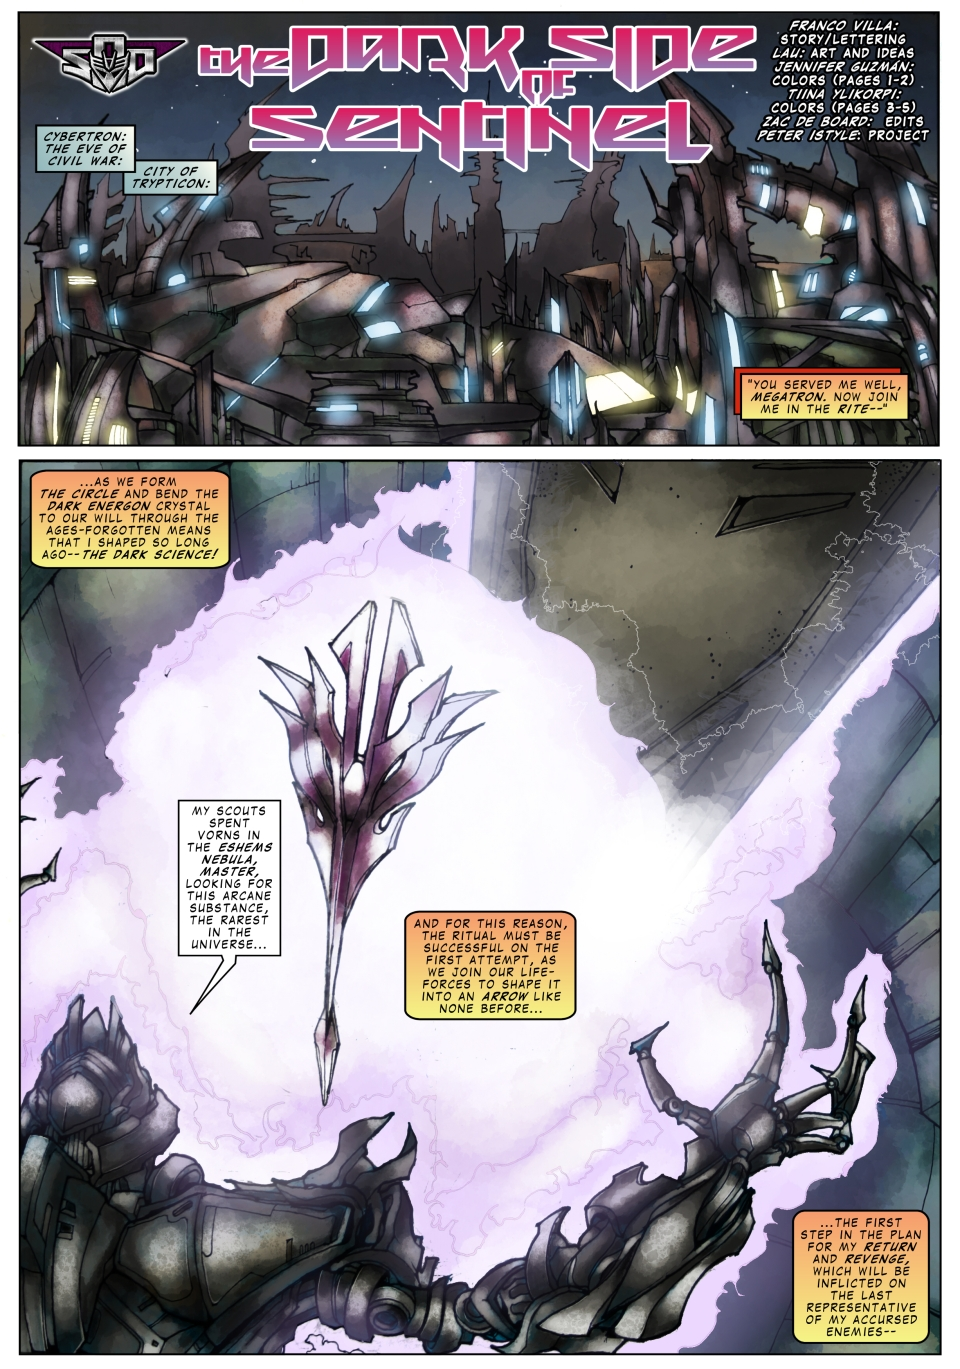 Dark Side Of Sentinel p01